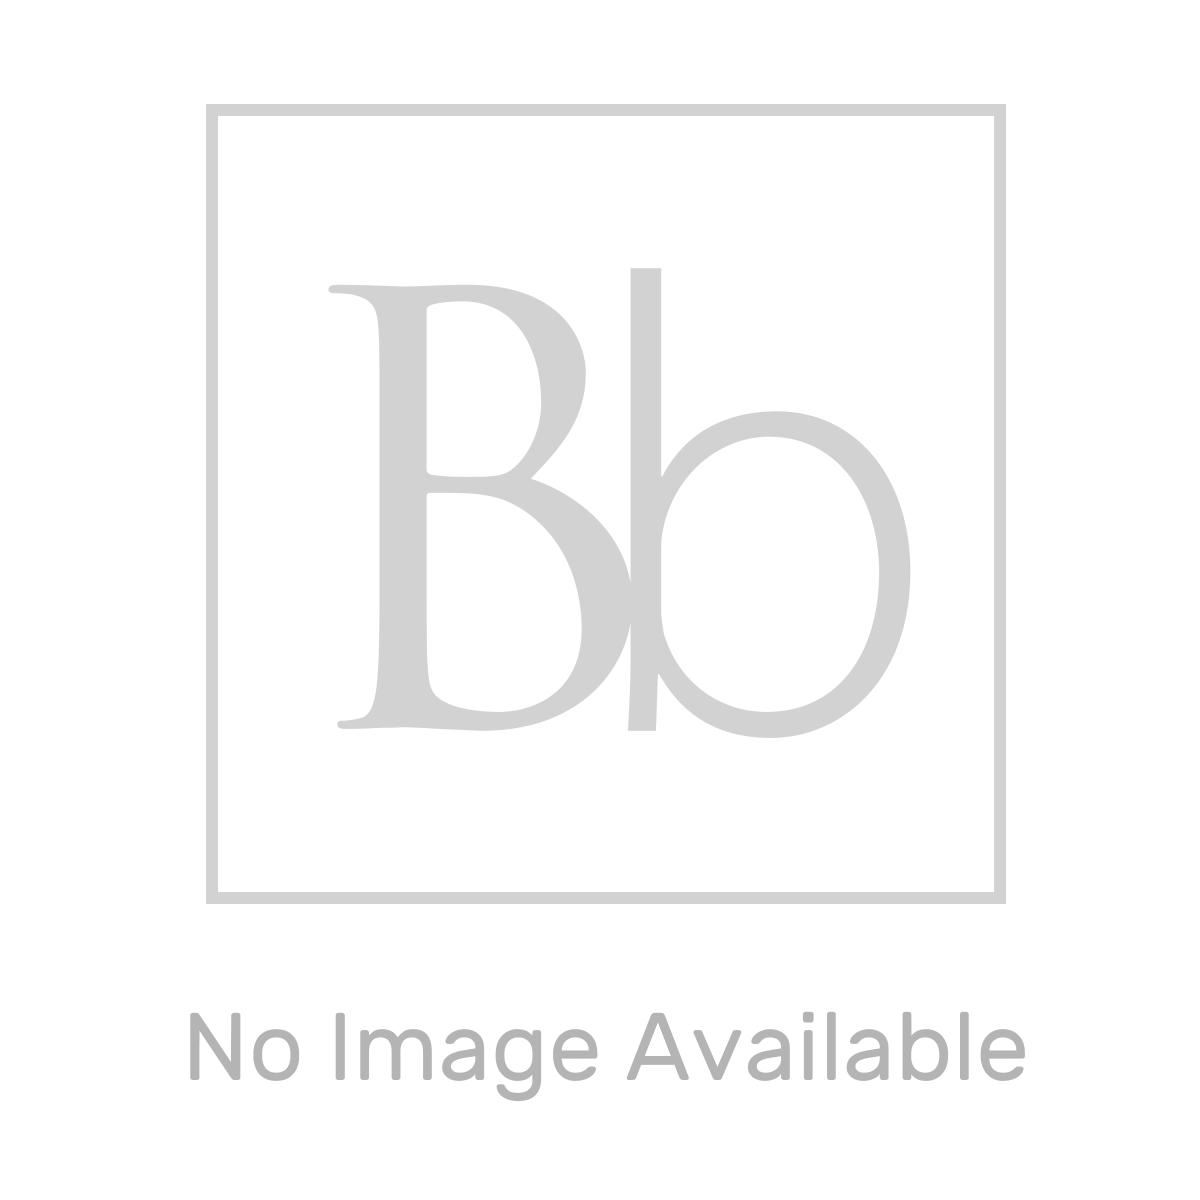 RAK Surface Greige Lappato Tile 600 x 600mm